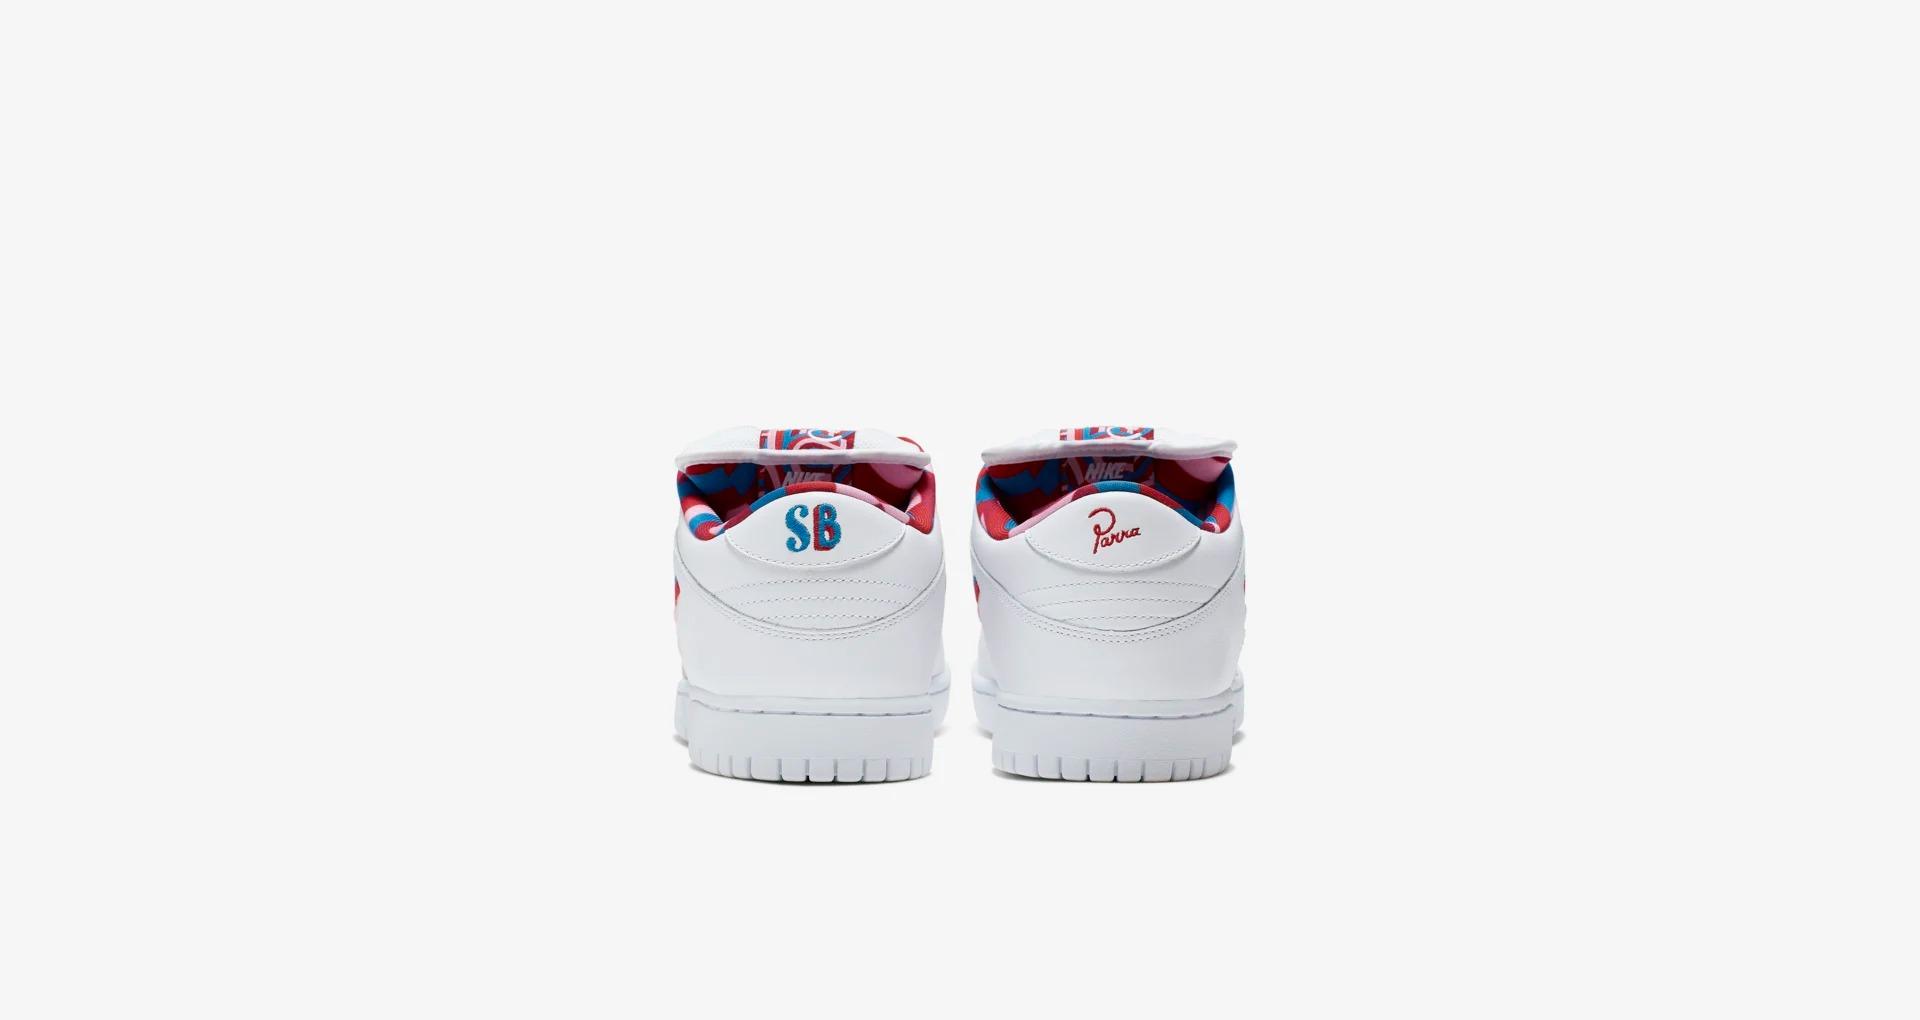 CN4504 100 Parra x Nike SB Dunk Low 5